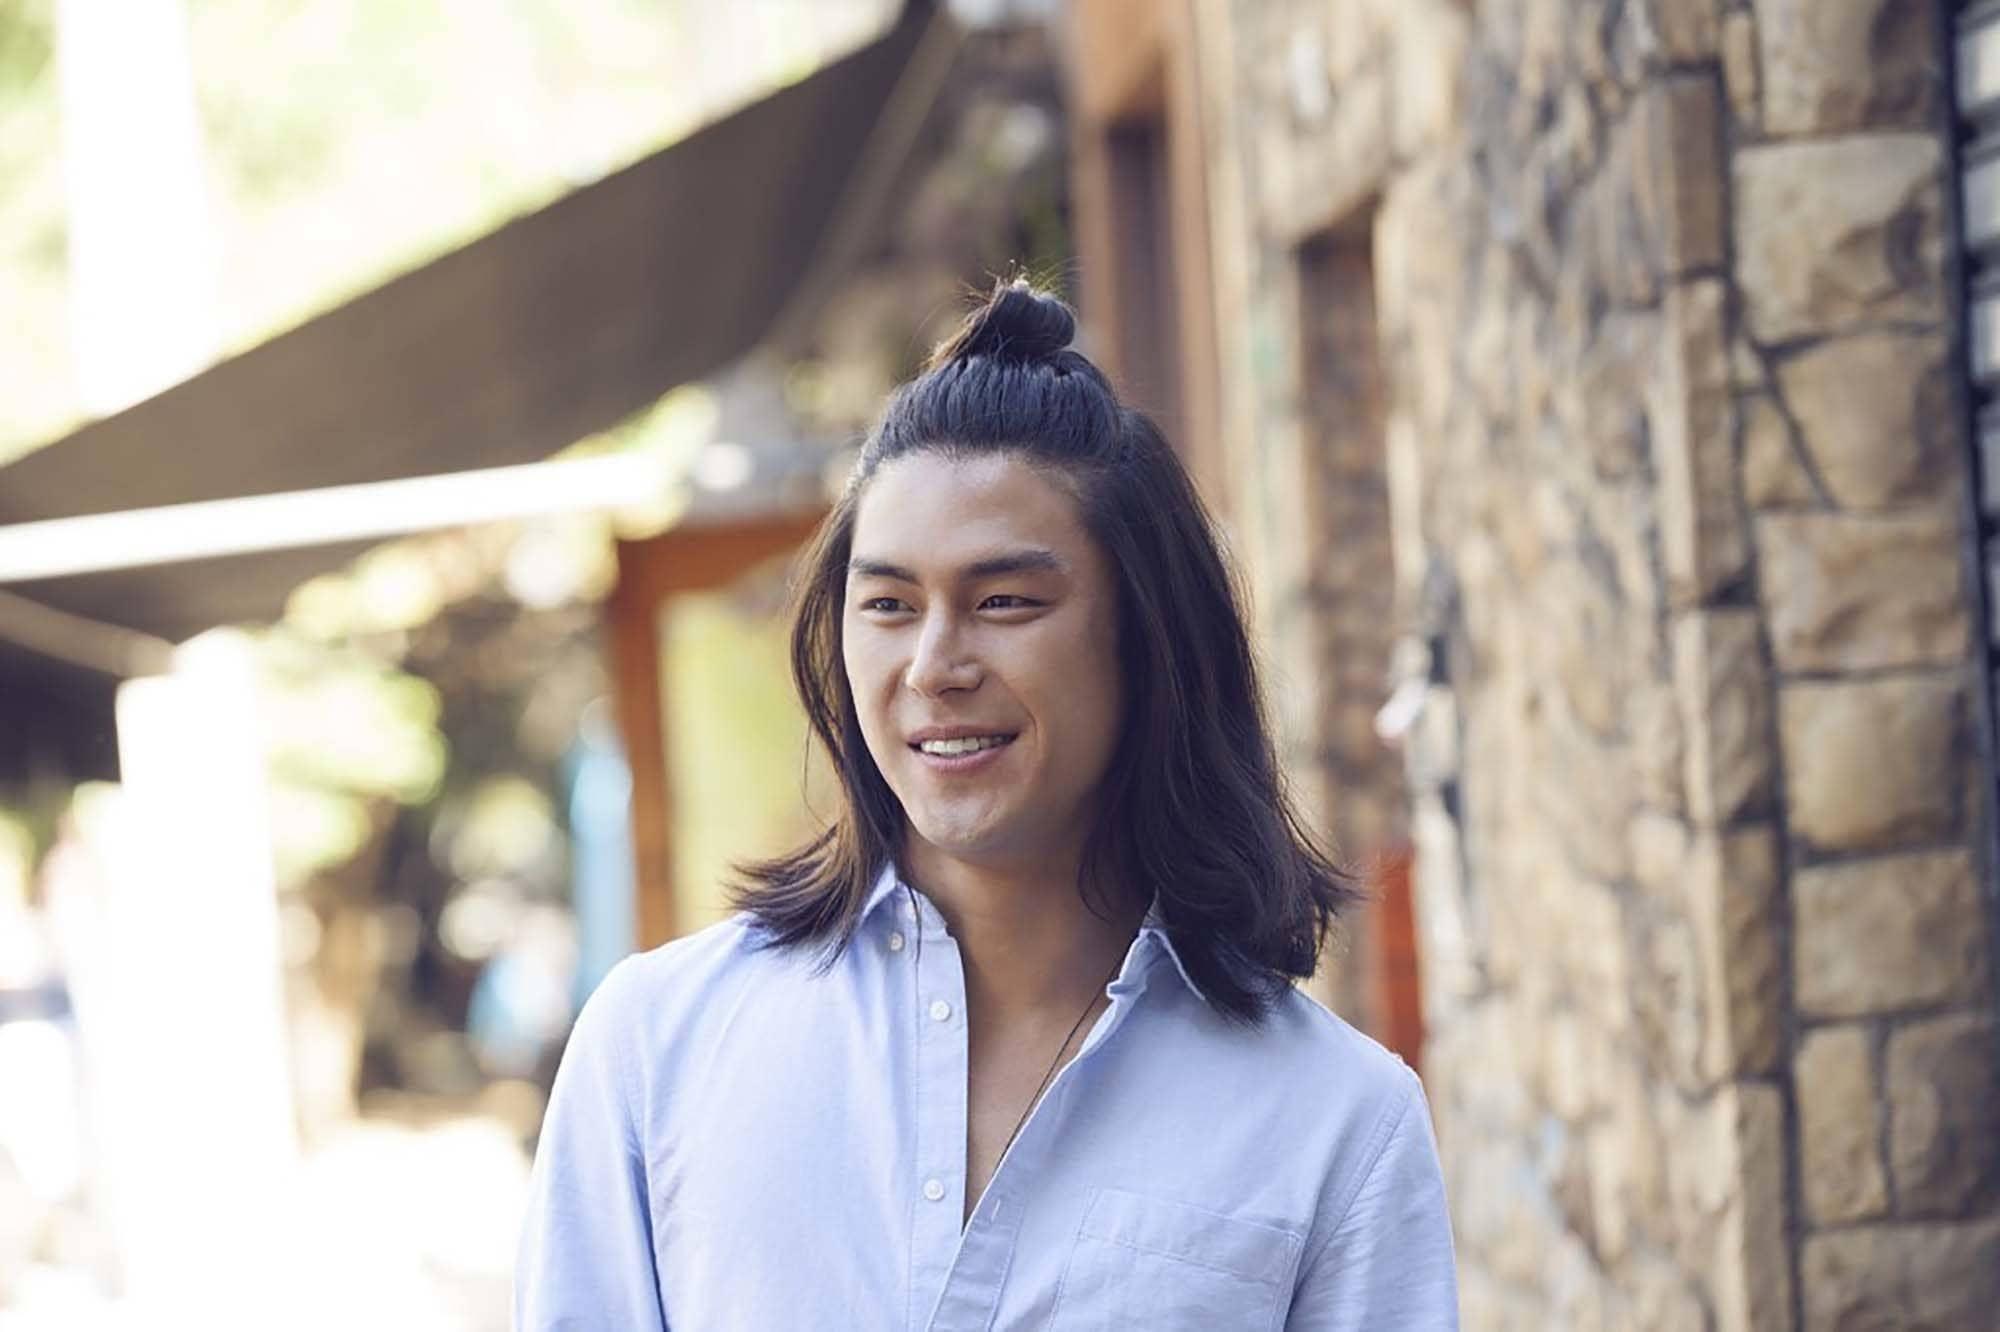 Asian man bun: Man with long black hair with a half up bun wearing a white shirt outdoors